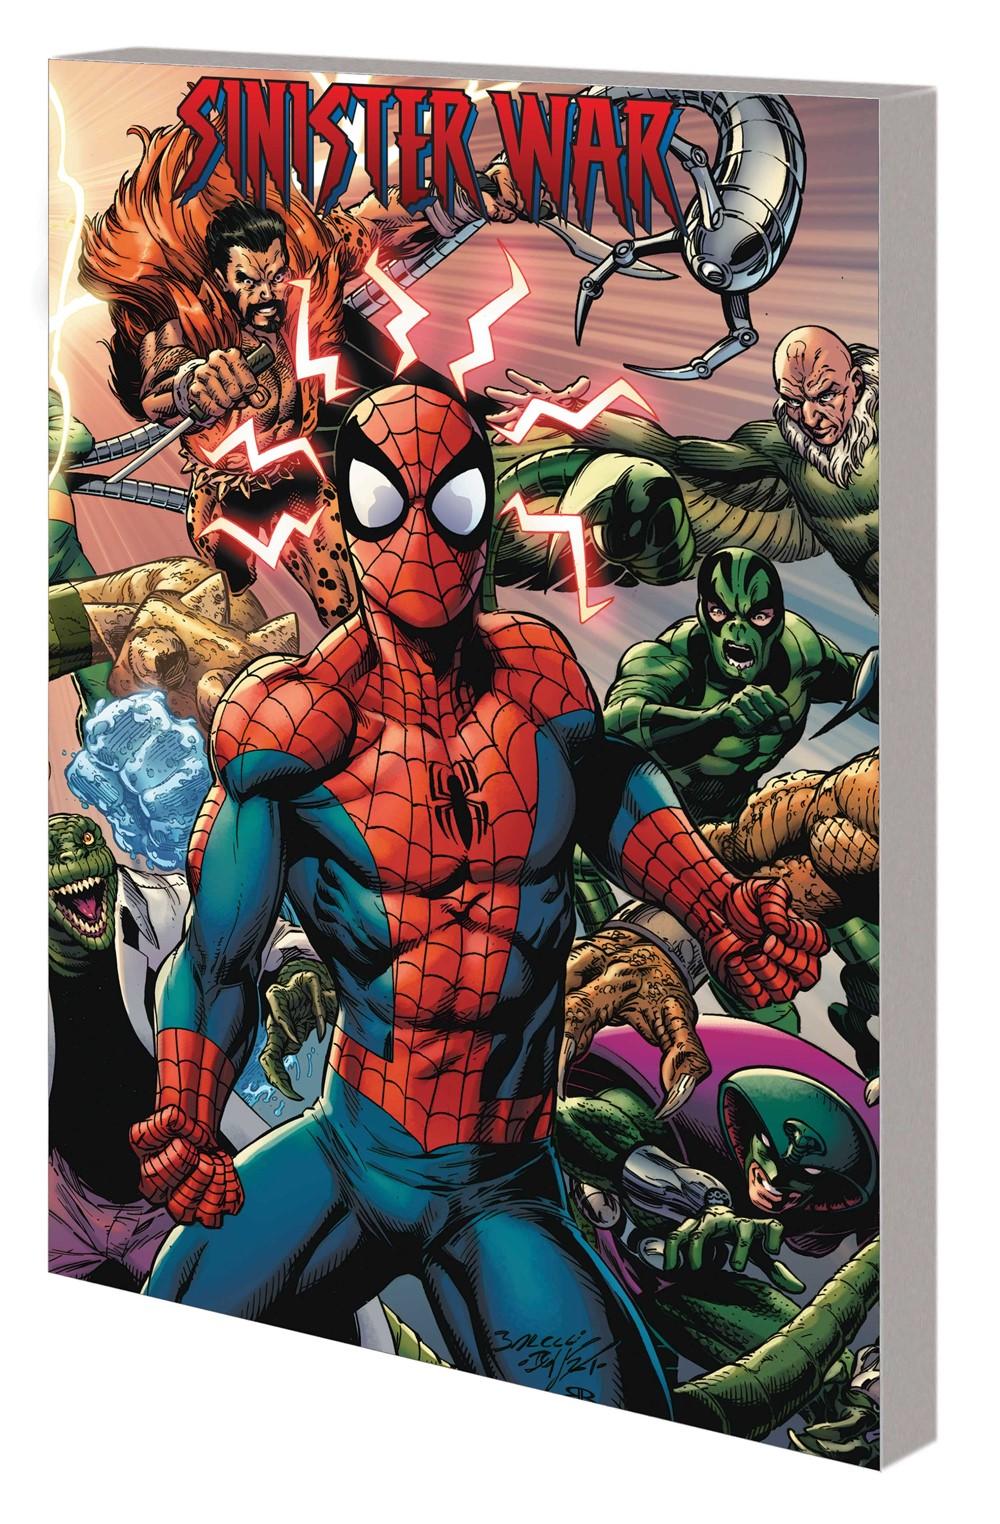 SINISTER_WAR_TPB Marvel Comics September 2021 Solicitations